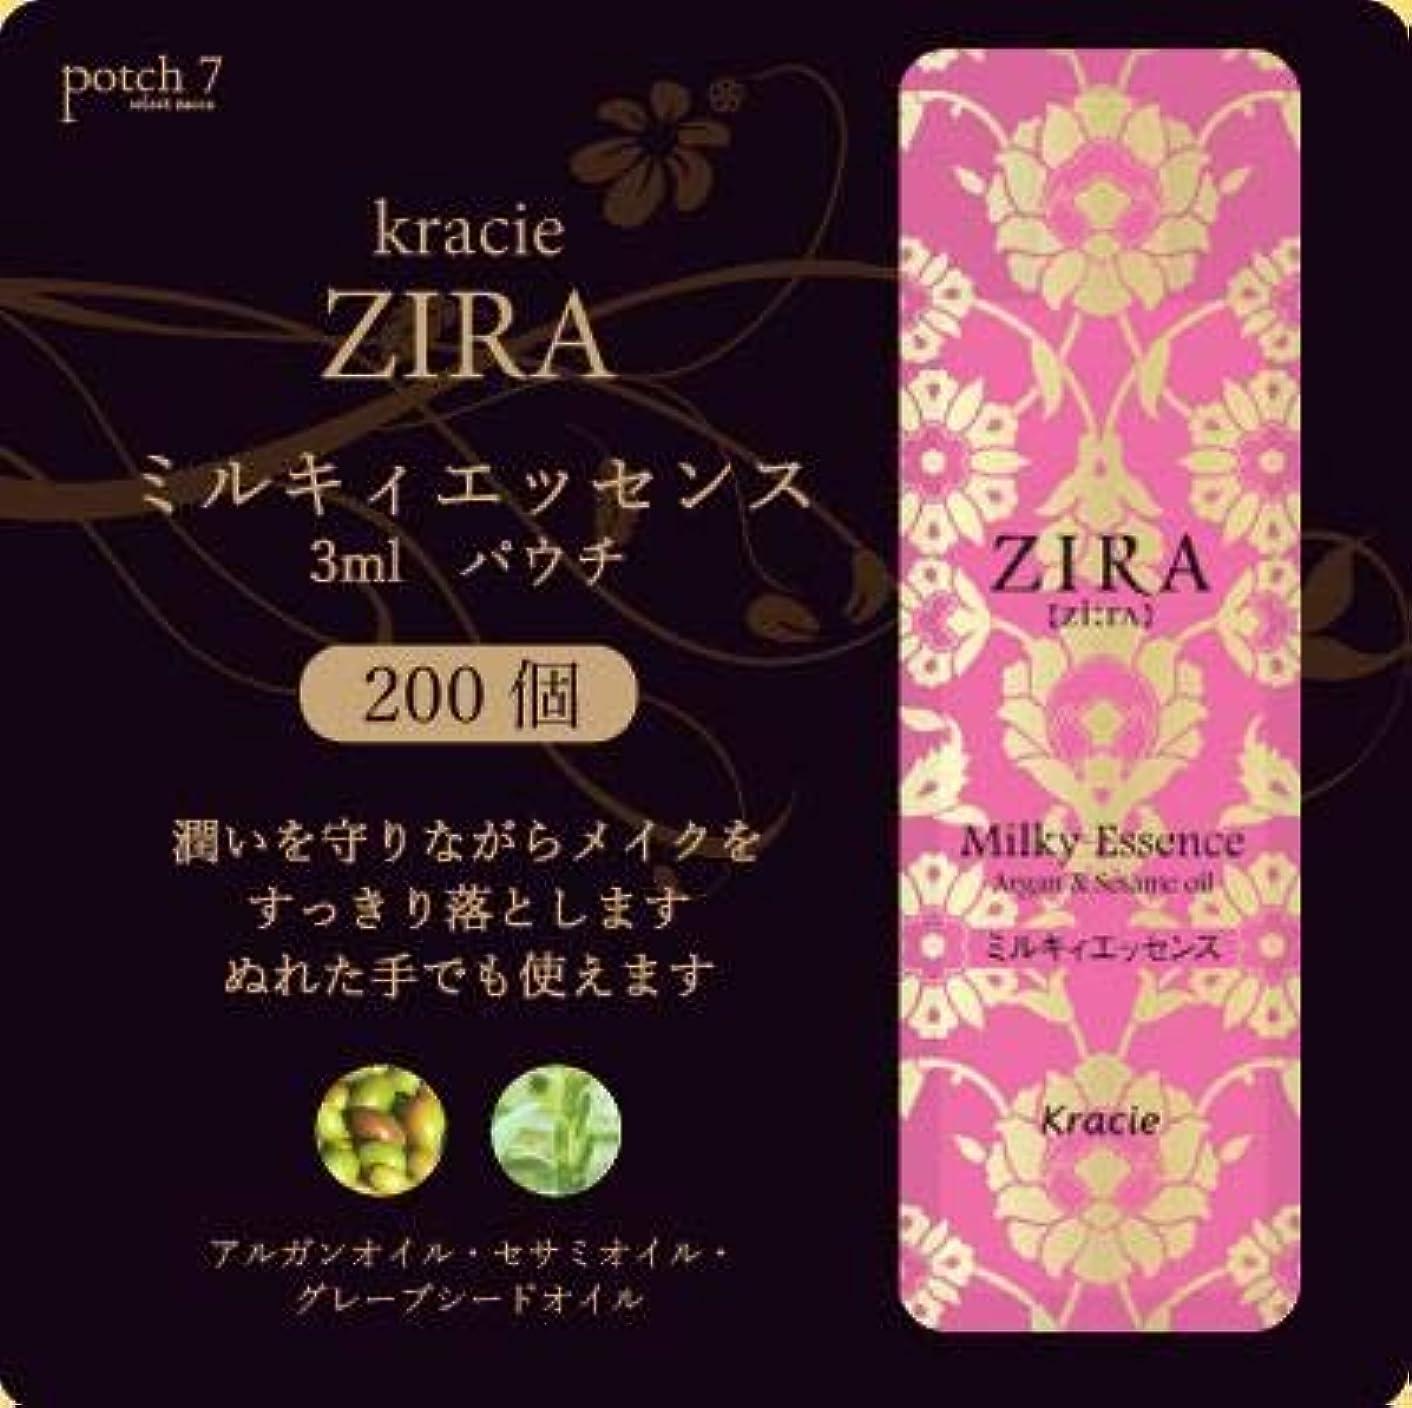 Kracie クラシエ ZIRA ジーラ ミルキィエッセンス 美容液 パウチ 3ml 200個入